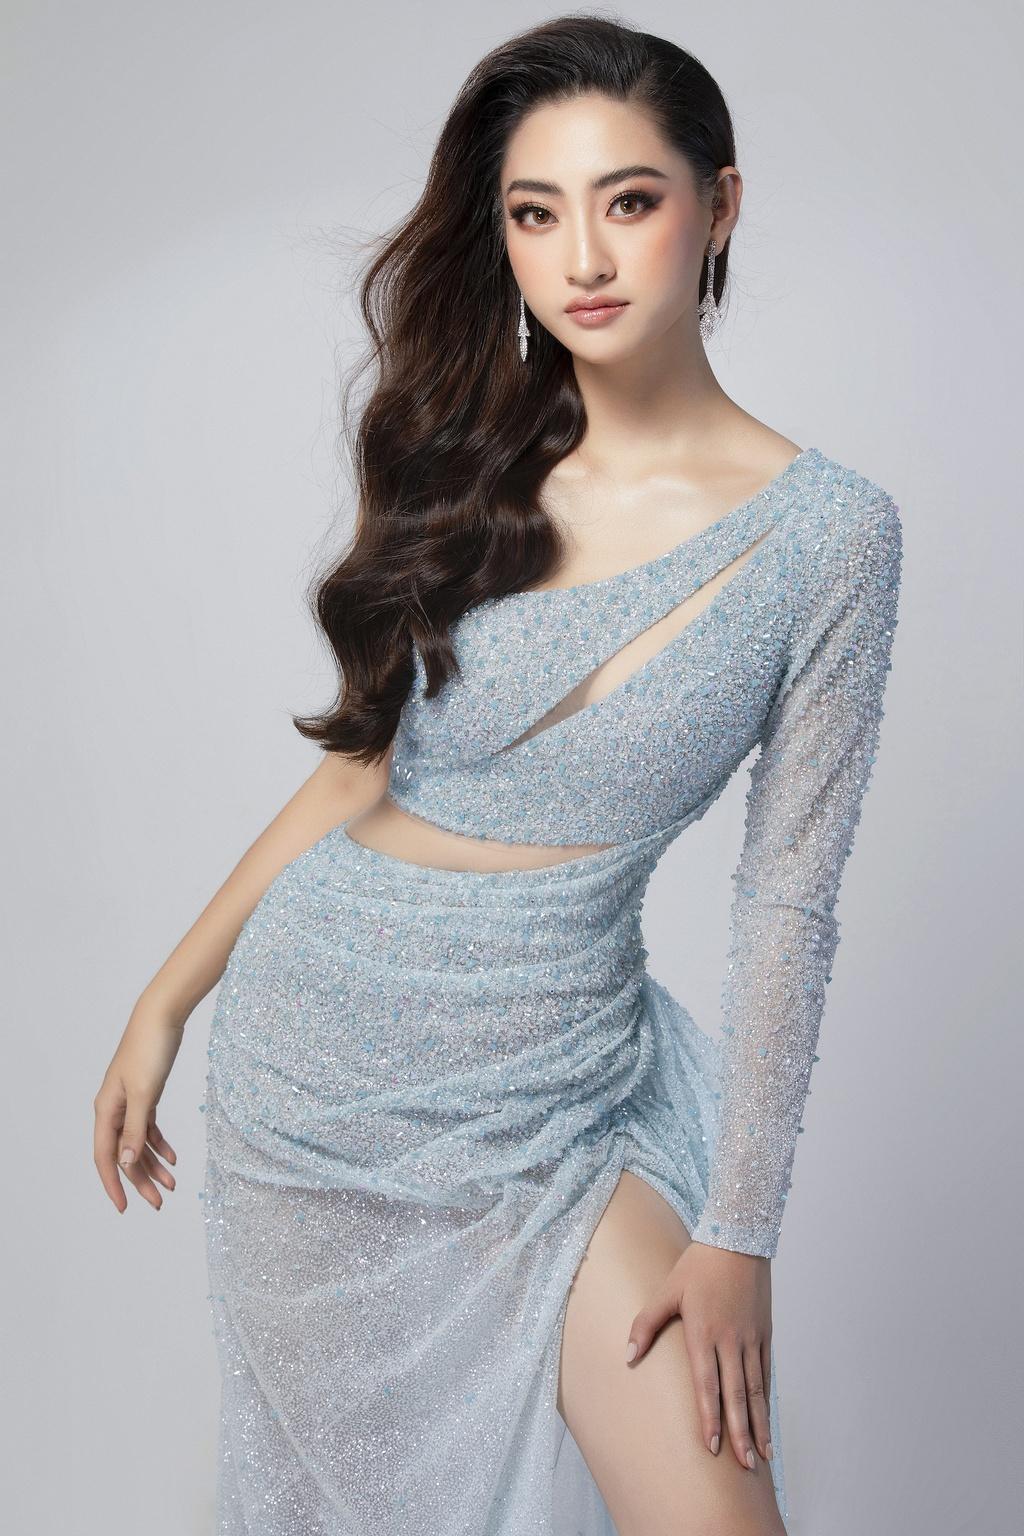 Luong Thuy Linh mac vay xe cao khoe chan 1,22 m o chung ket Miss World hinh anh 4 null